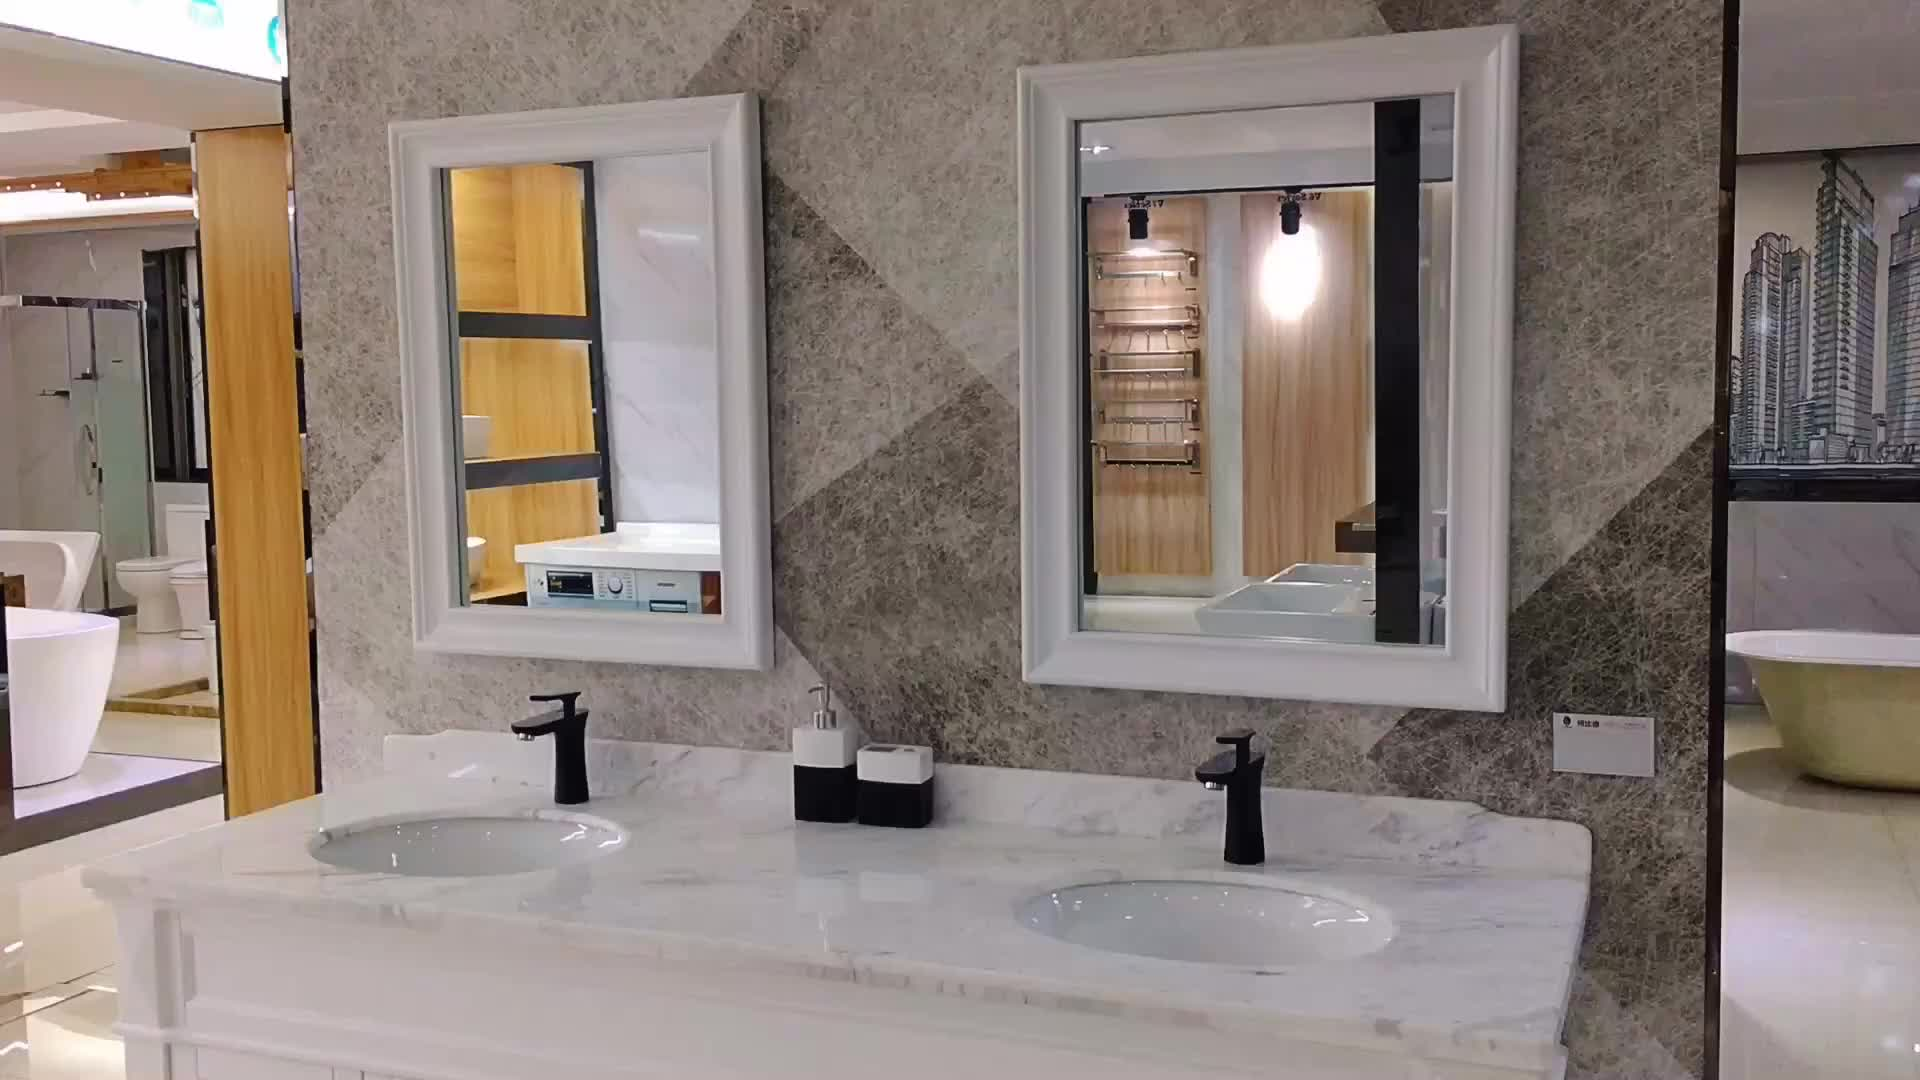 Inch dubbele wastafel badkamer ijdelheid wit marmeren badkamer